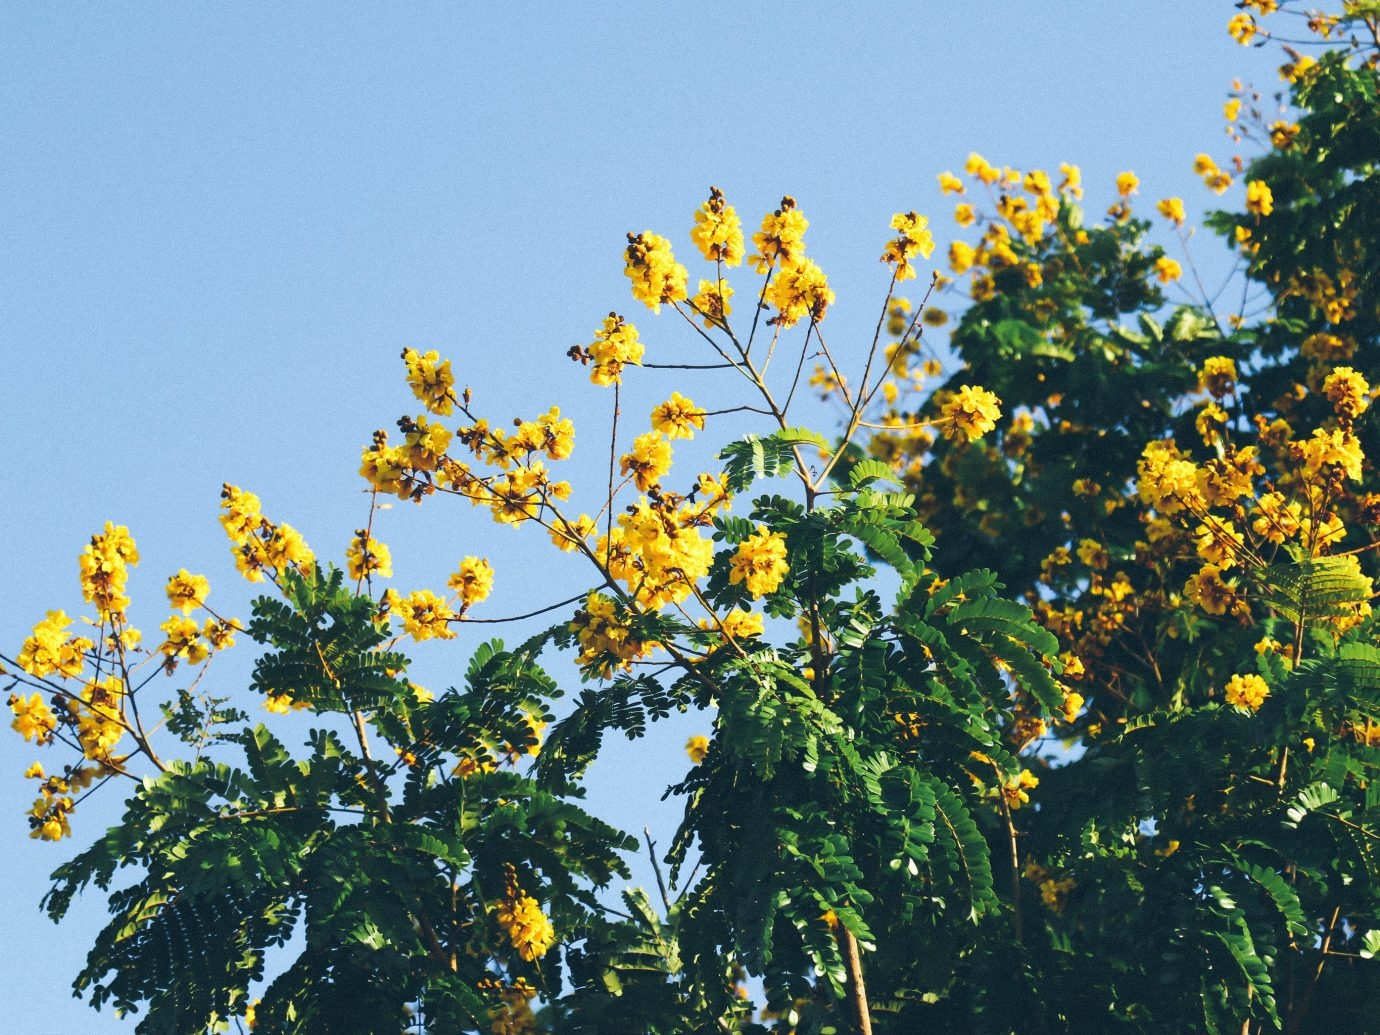 Trip Ideas tree sky outdoor yellow flower flora plant botany leaf branch land plant sunlight blossom produce flowering plant wildflower rapeseed shrub maidenhair tree